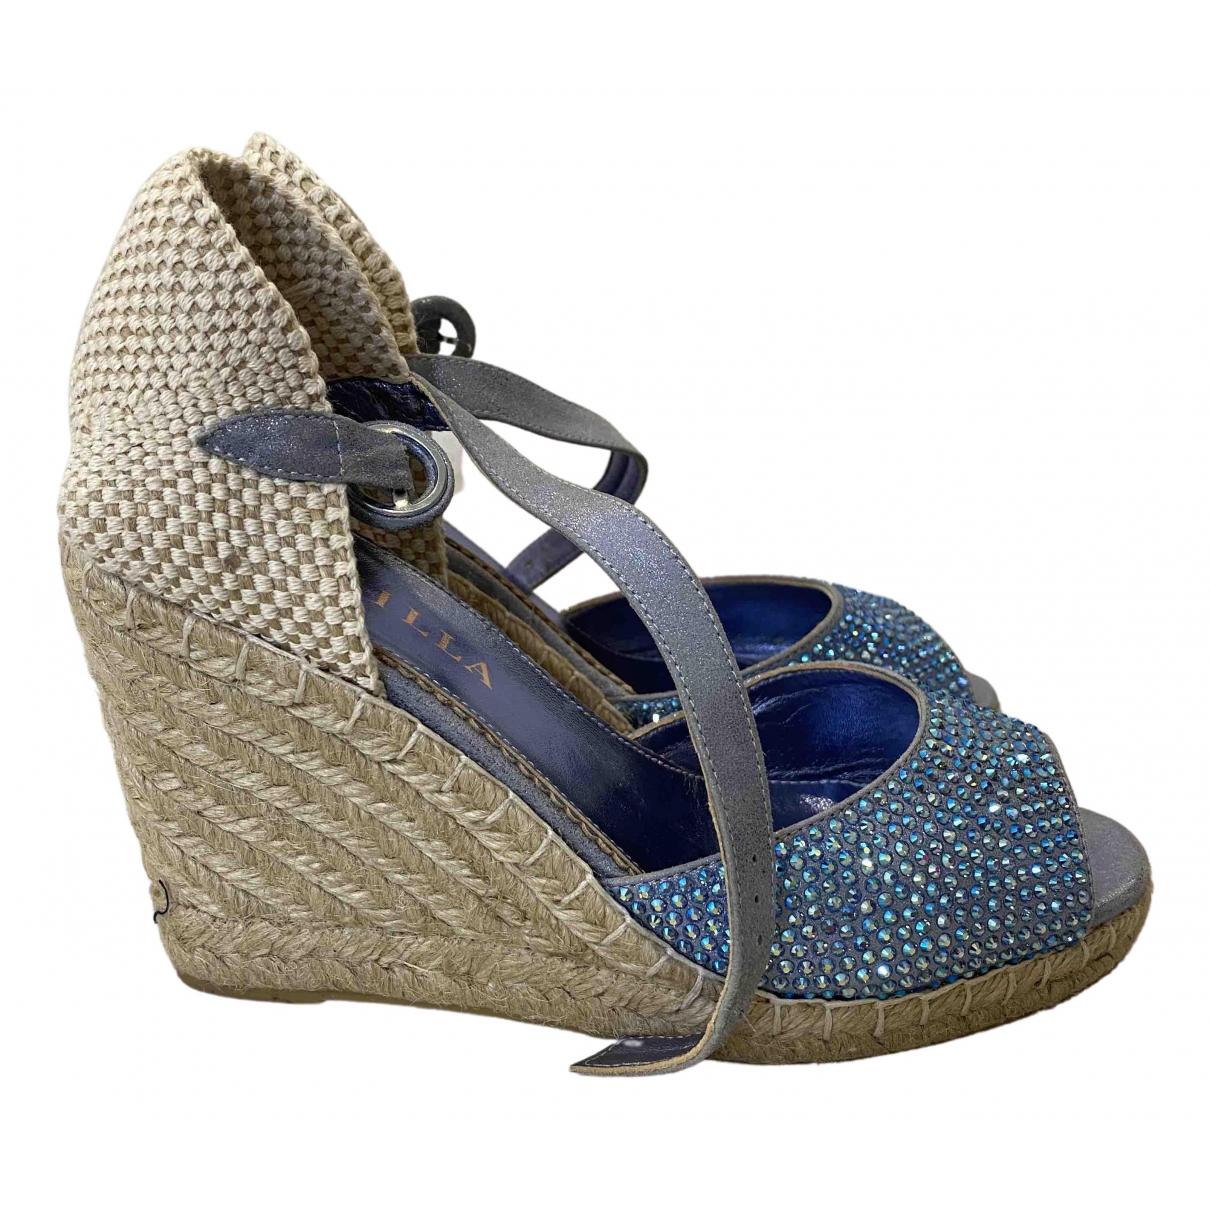 Le Silla \N Ballerinas in  Blau Leinen